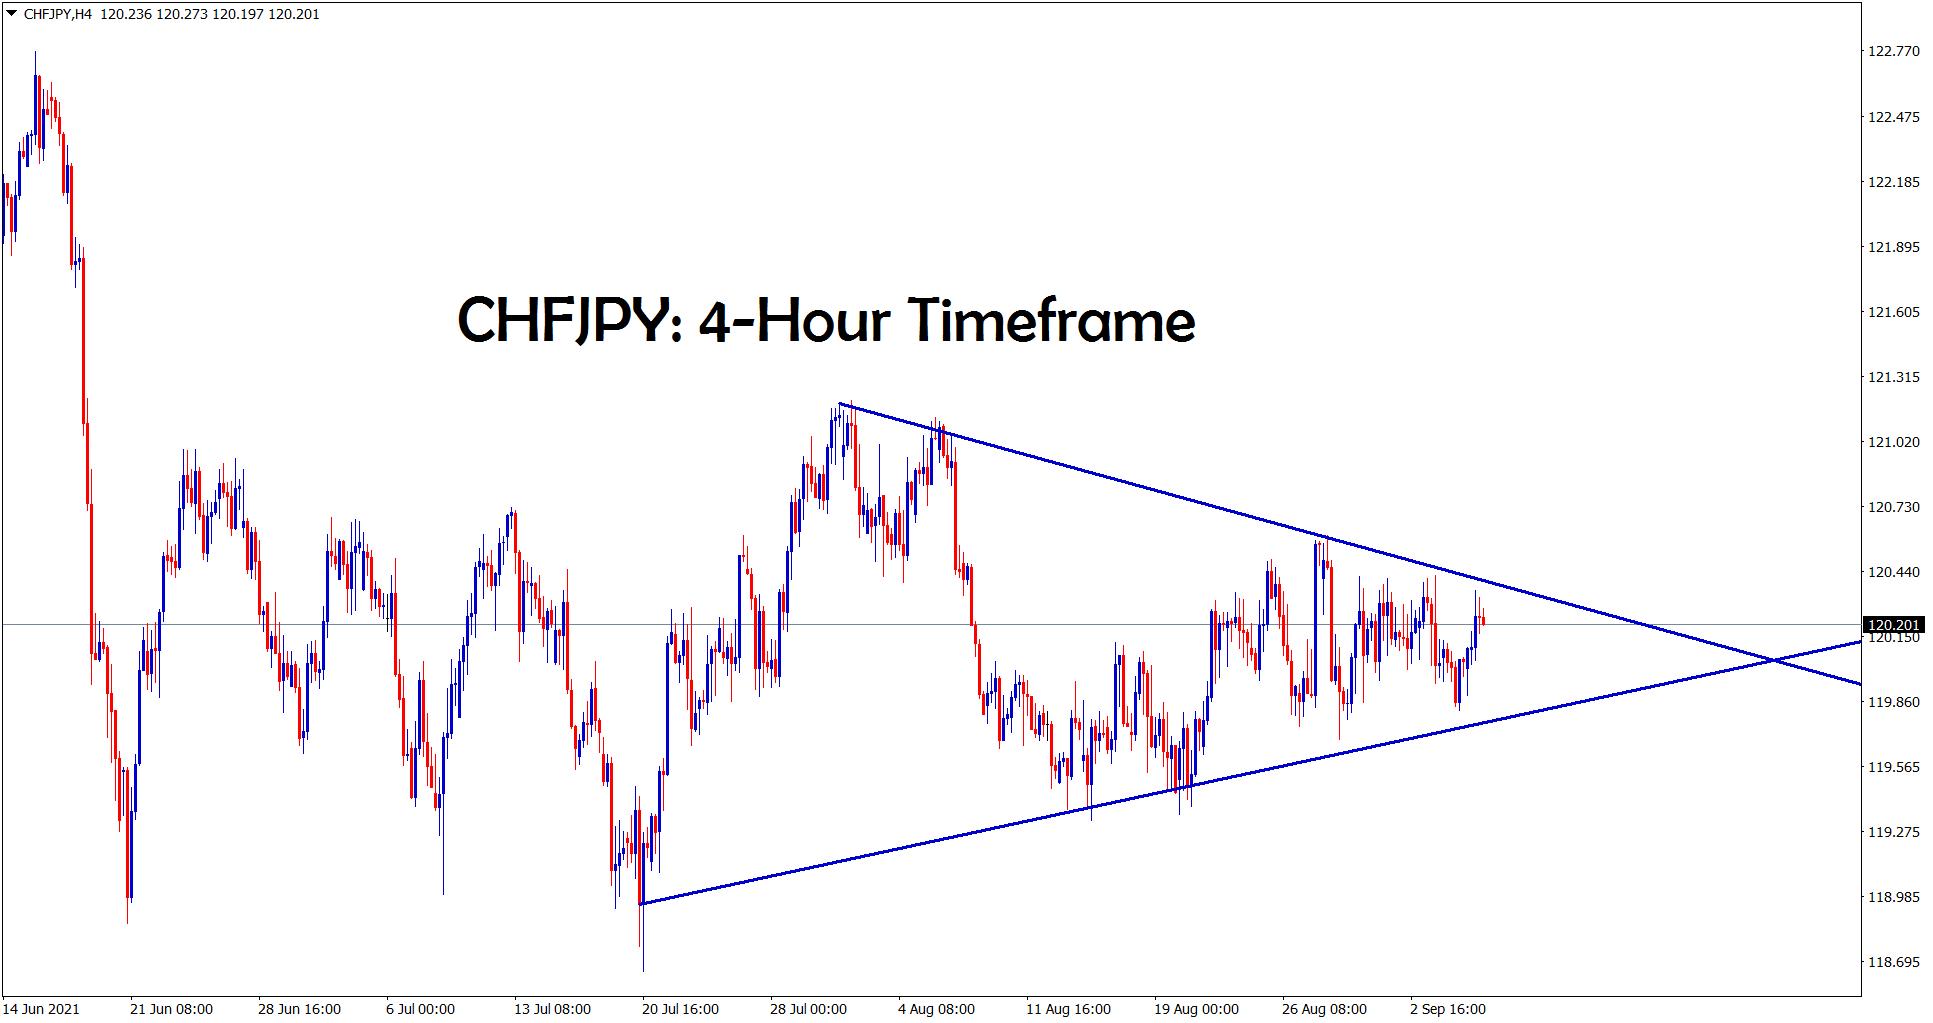 CHFJPY is going to break the symmetrical triangle pattern wait for the breakout